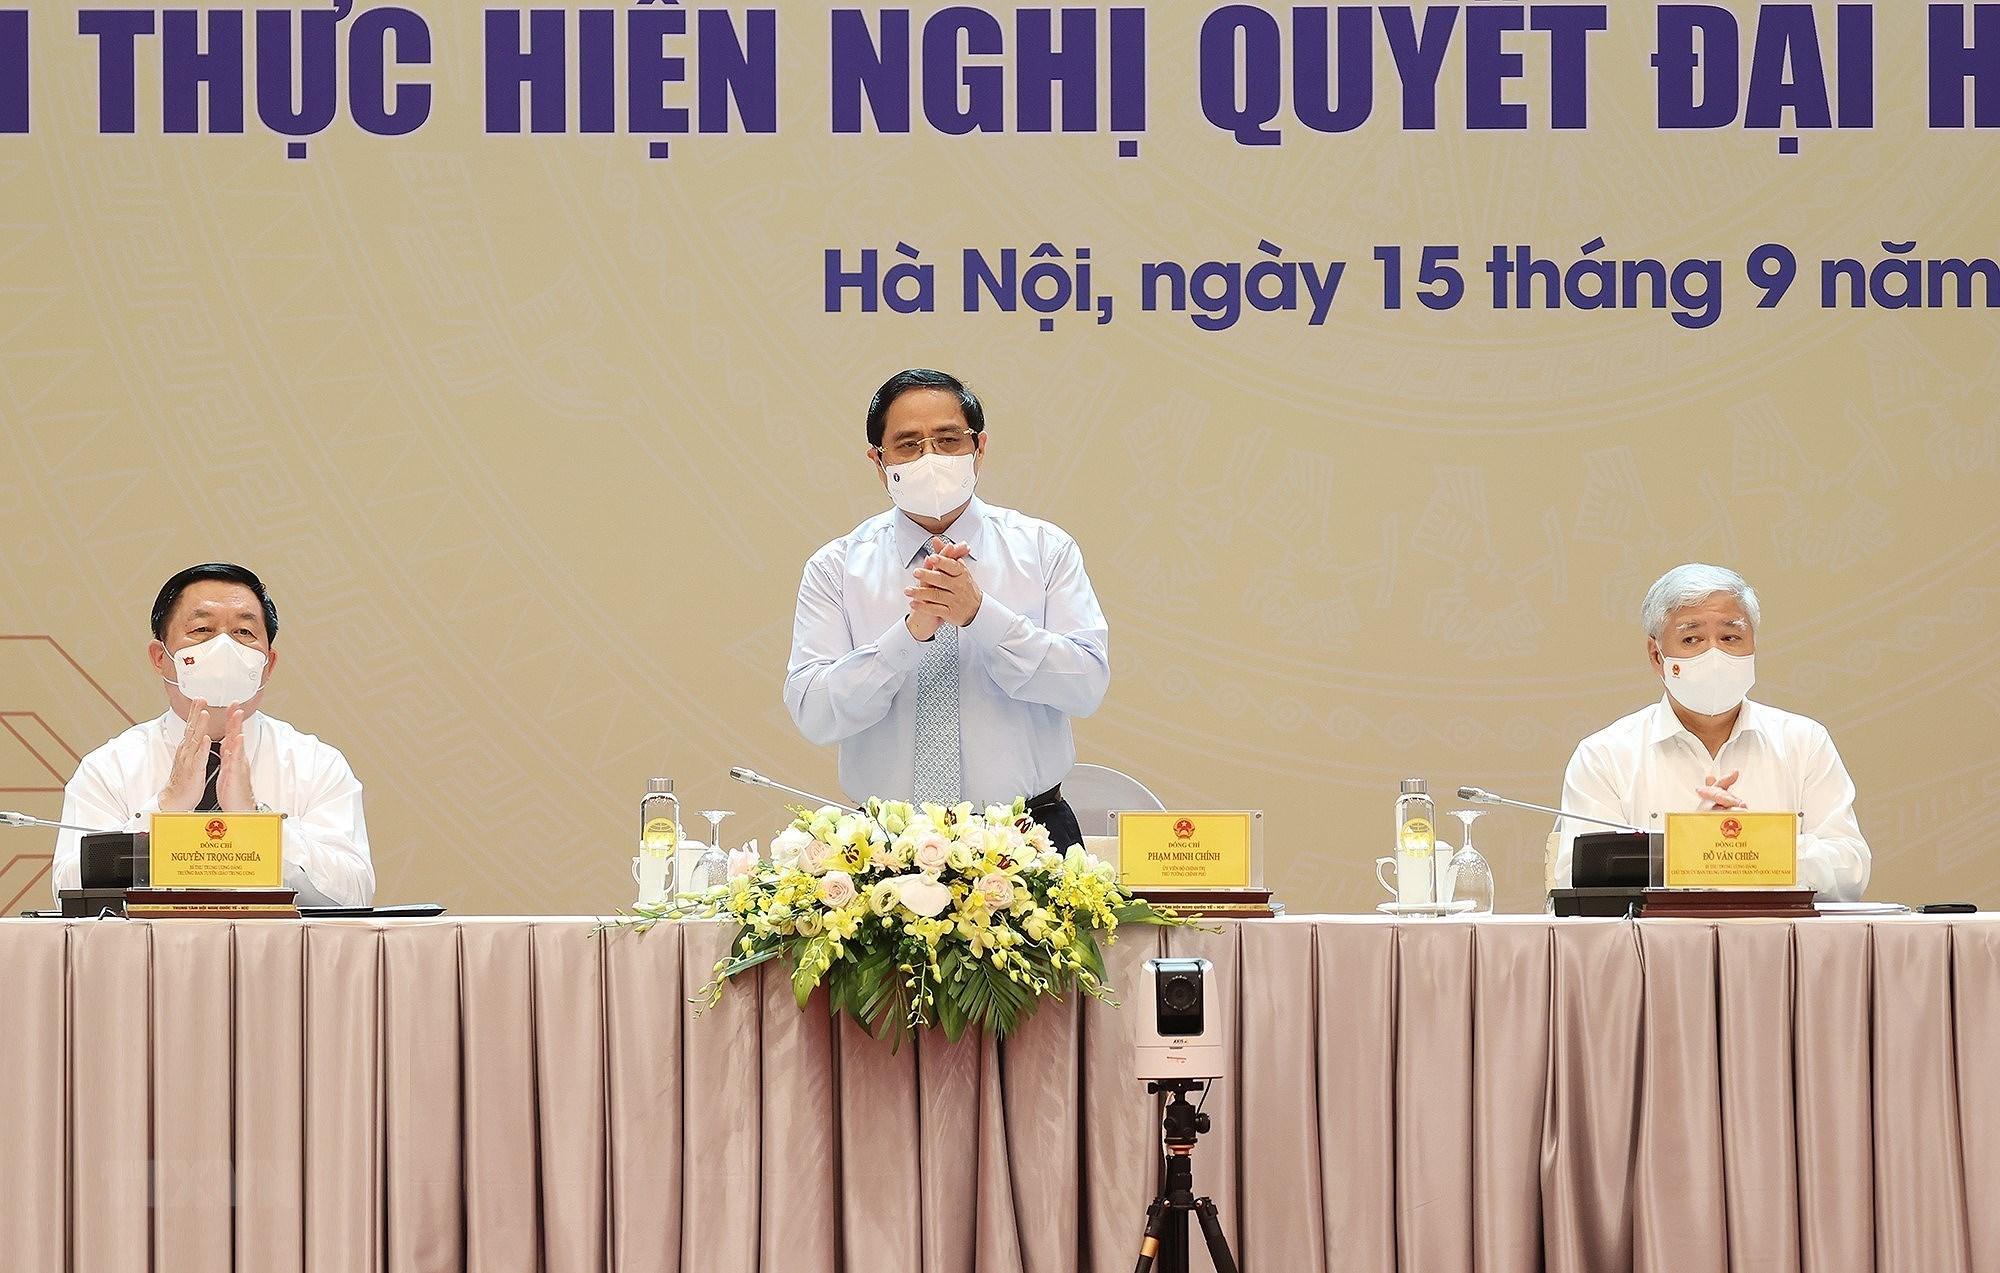 Thu tuong du Hoi nghi doi ngu tri thuc khoa hoc va cong nghe Viet Nam hinh anh 5